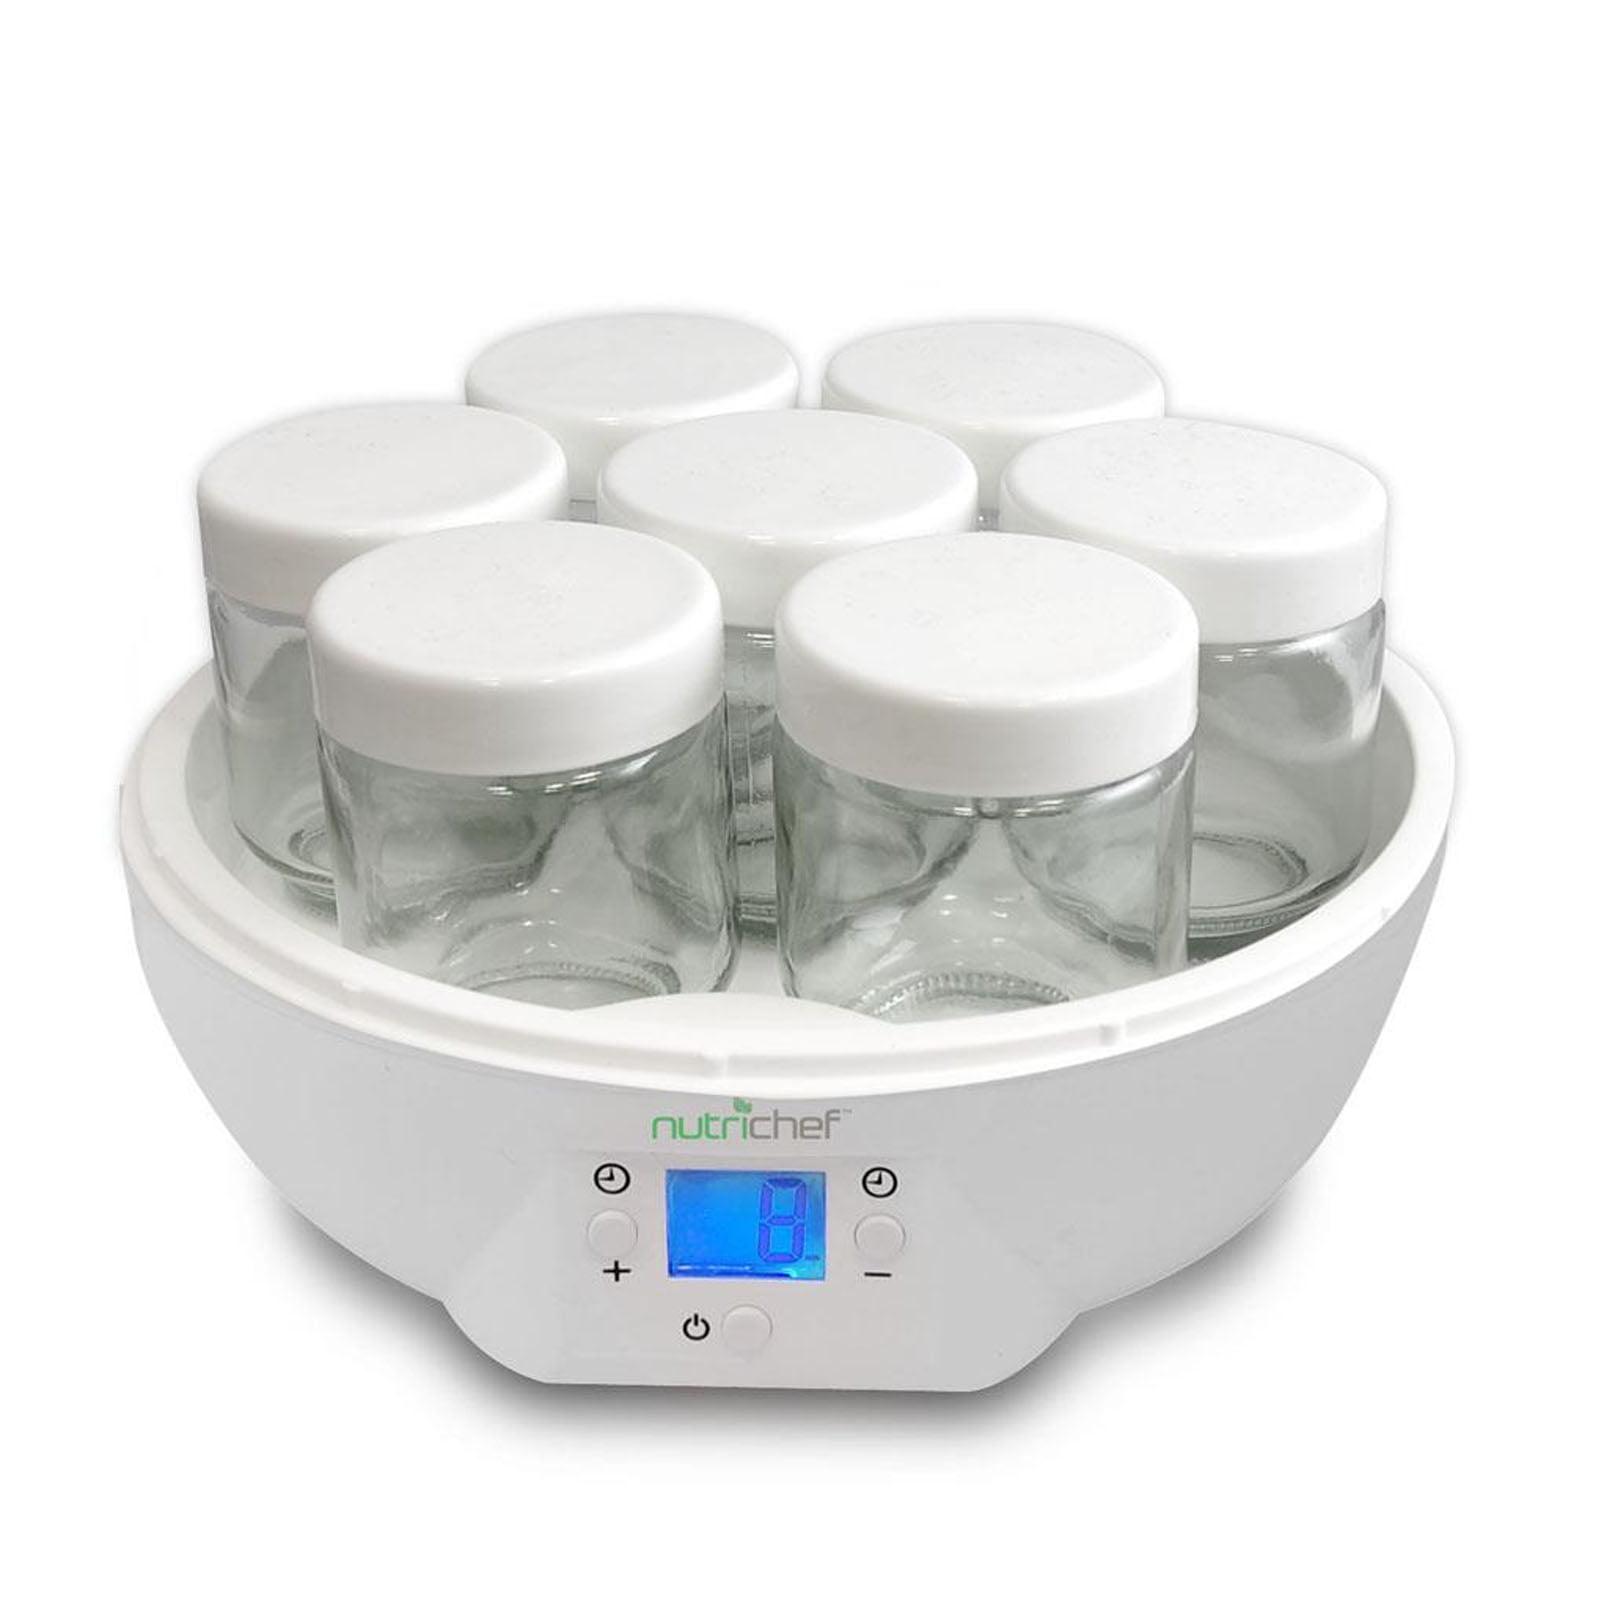 NutriChef Electronic Yogurt Maker